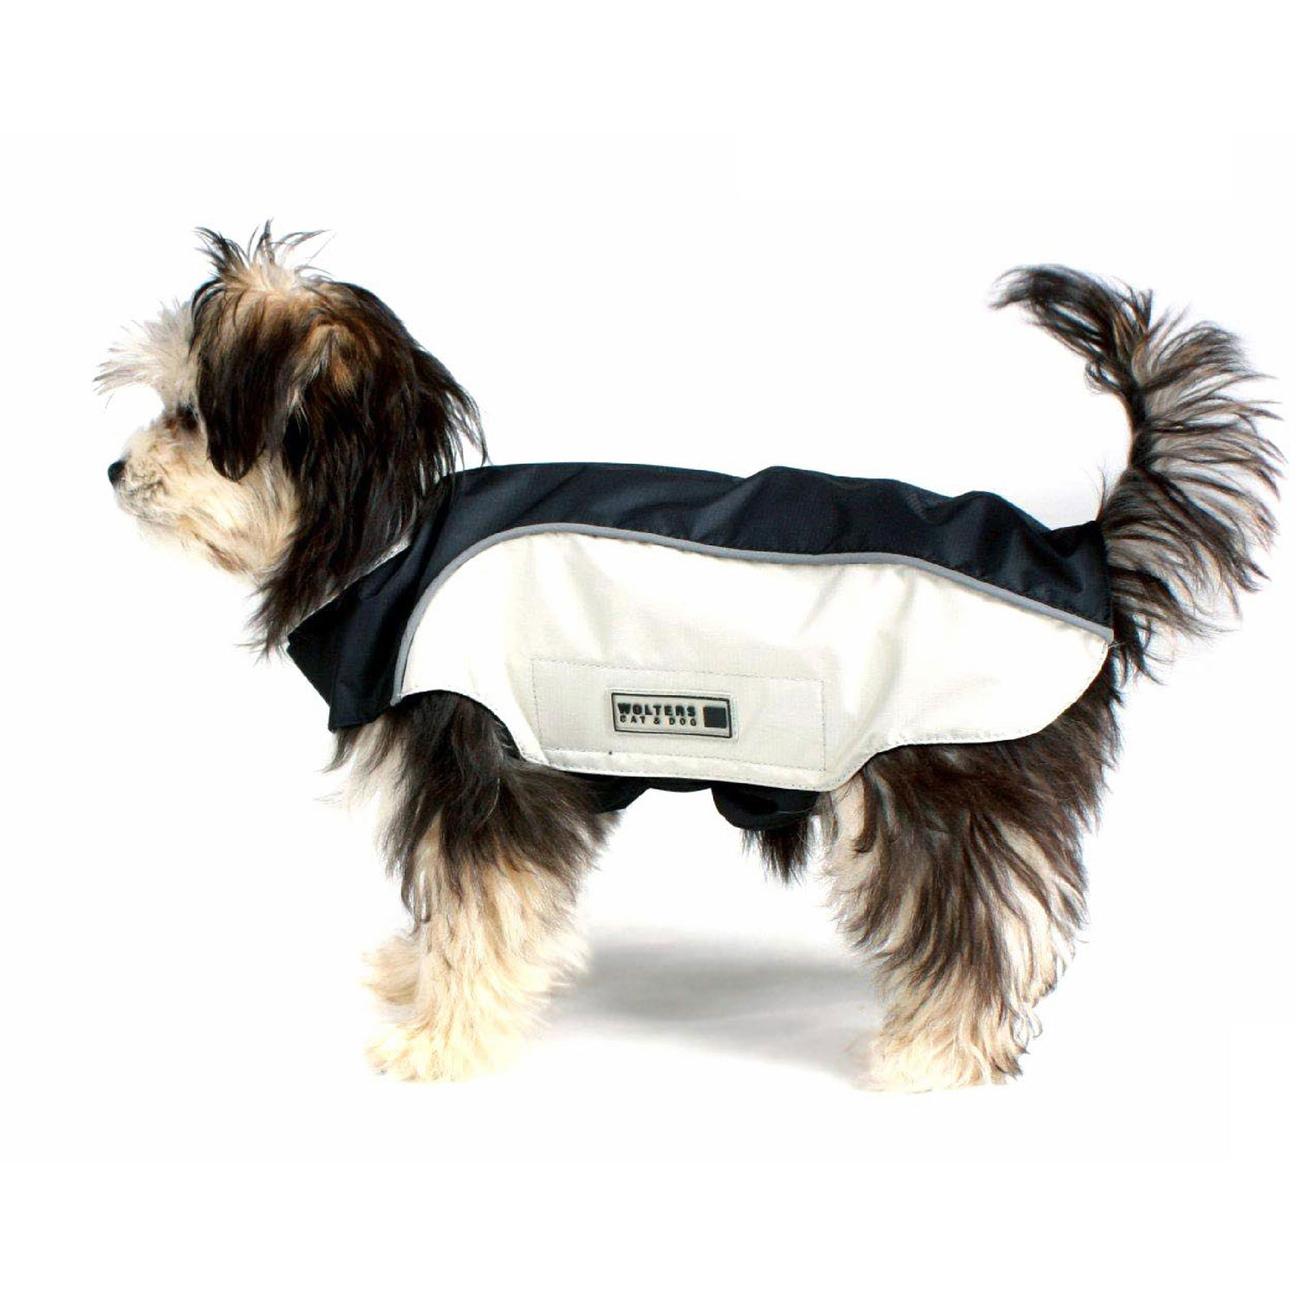 Wolters WOLTERS Regenjacke für Hunde Easy Rain, Bild 13